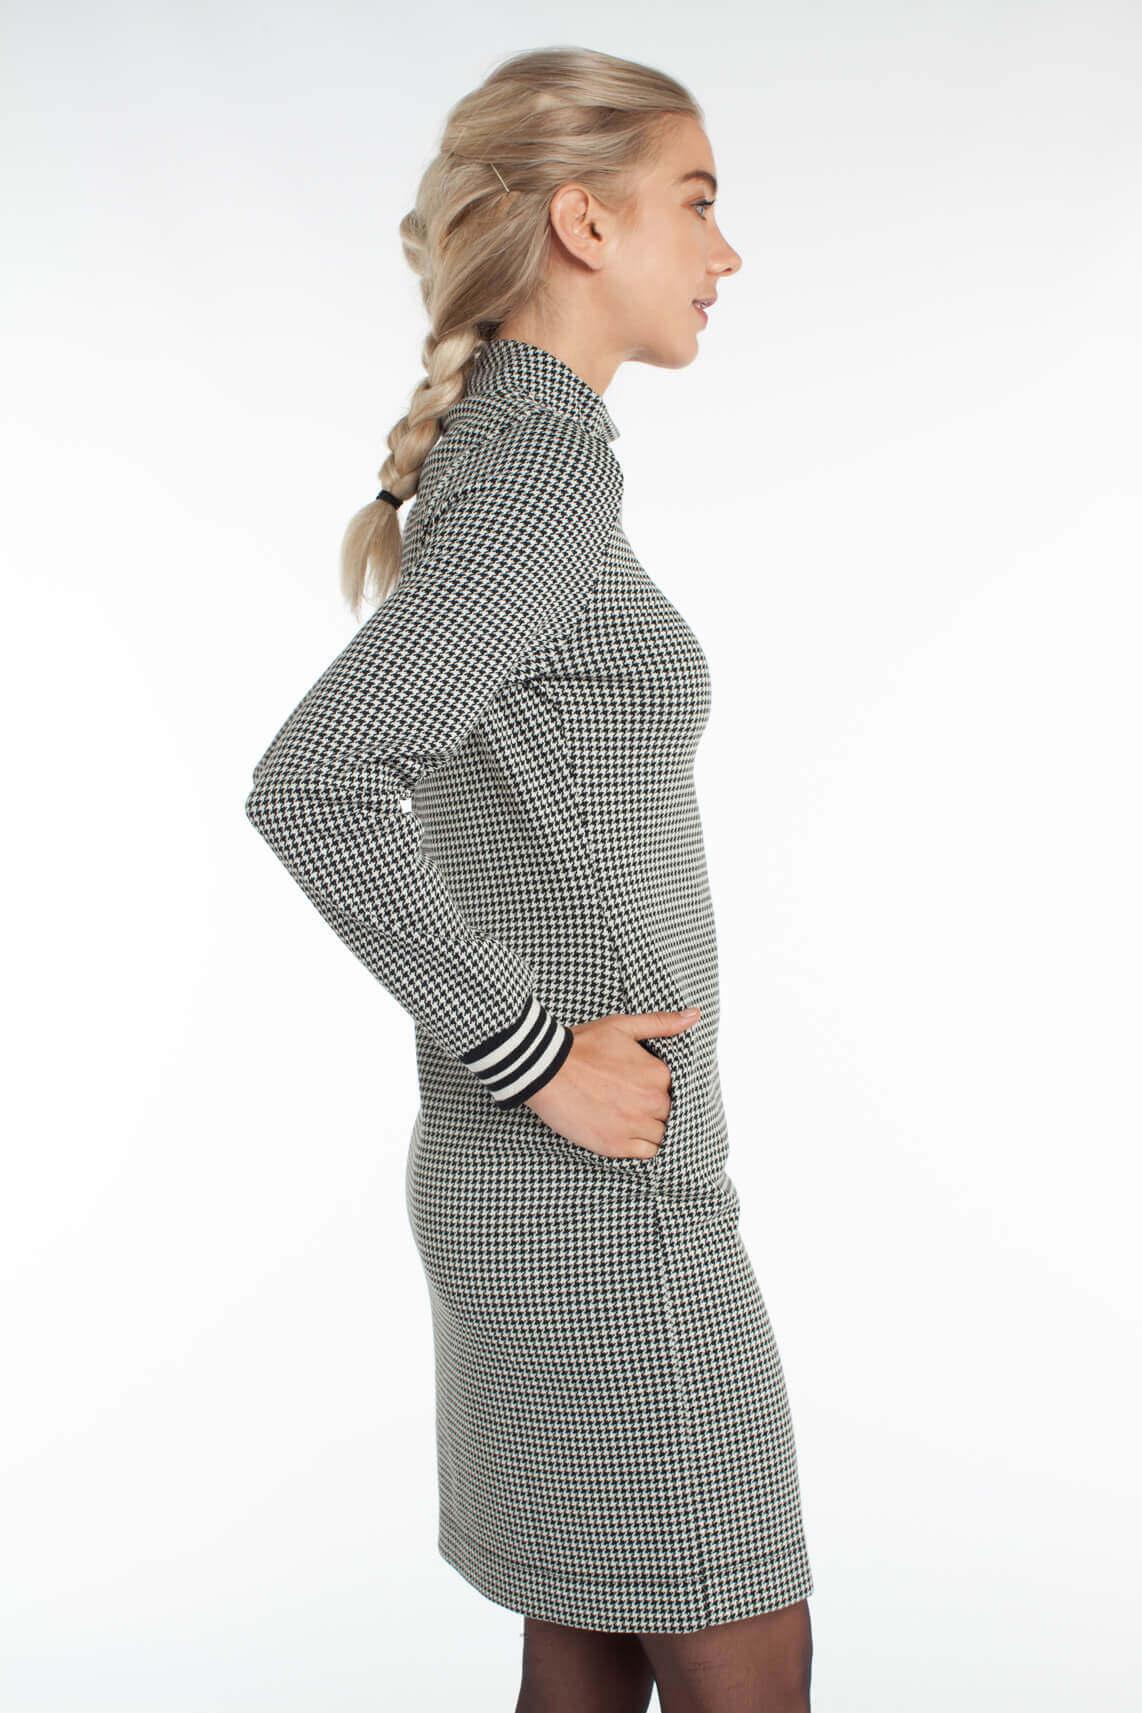 Anna Dames Pied-de-poule jurk zwart